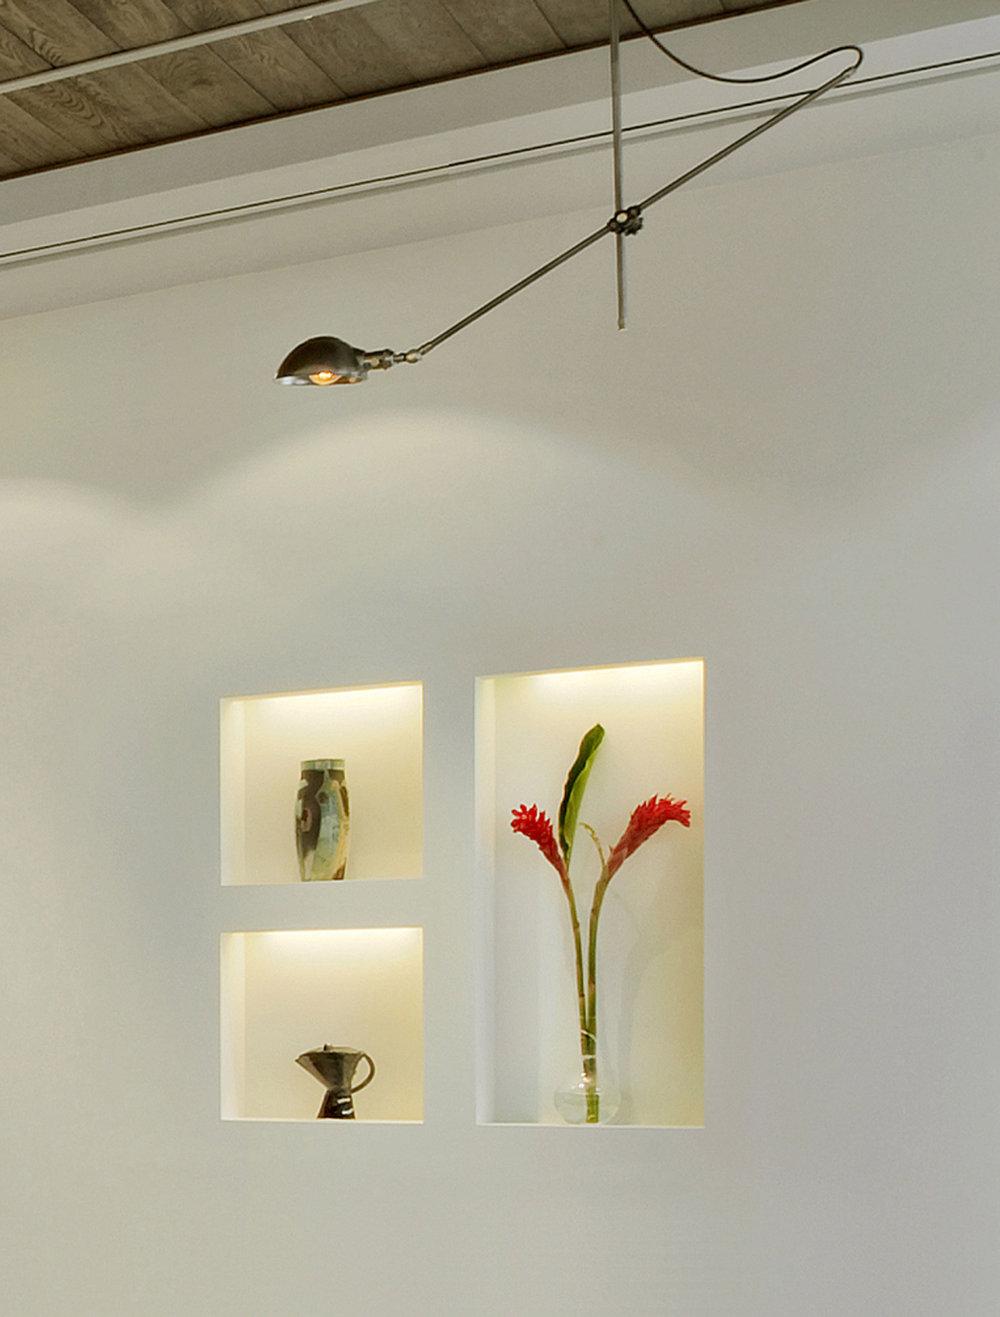 NYC Loft Renovation - Wall Niche and Pendant Light